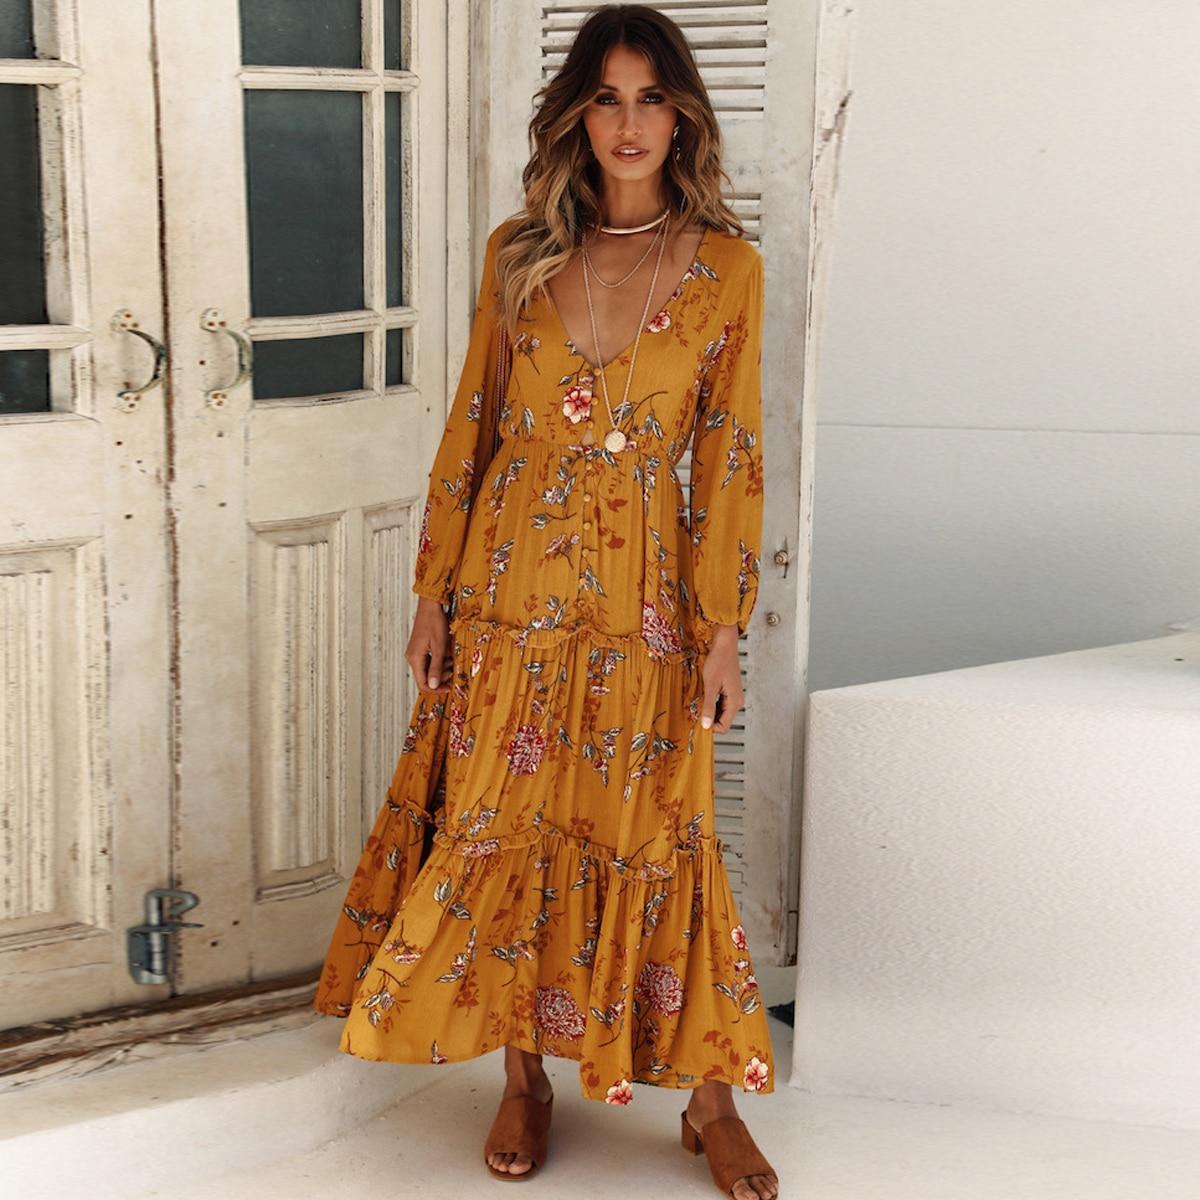 Jastie Boho chic Floral Print Midi Dress Women V Neck Long Sleeve Autumn Dresses Button Front Elastic Waist Casual Beach Dress